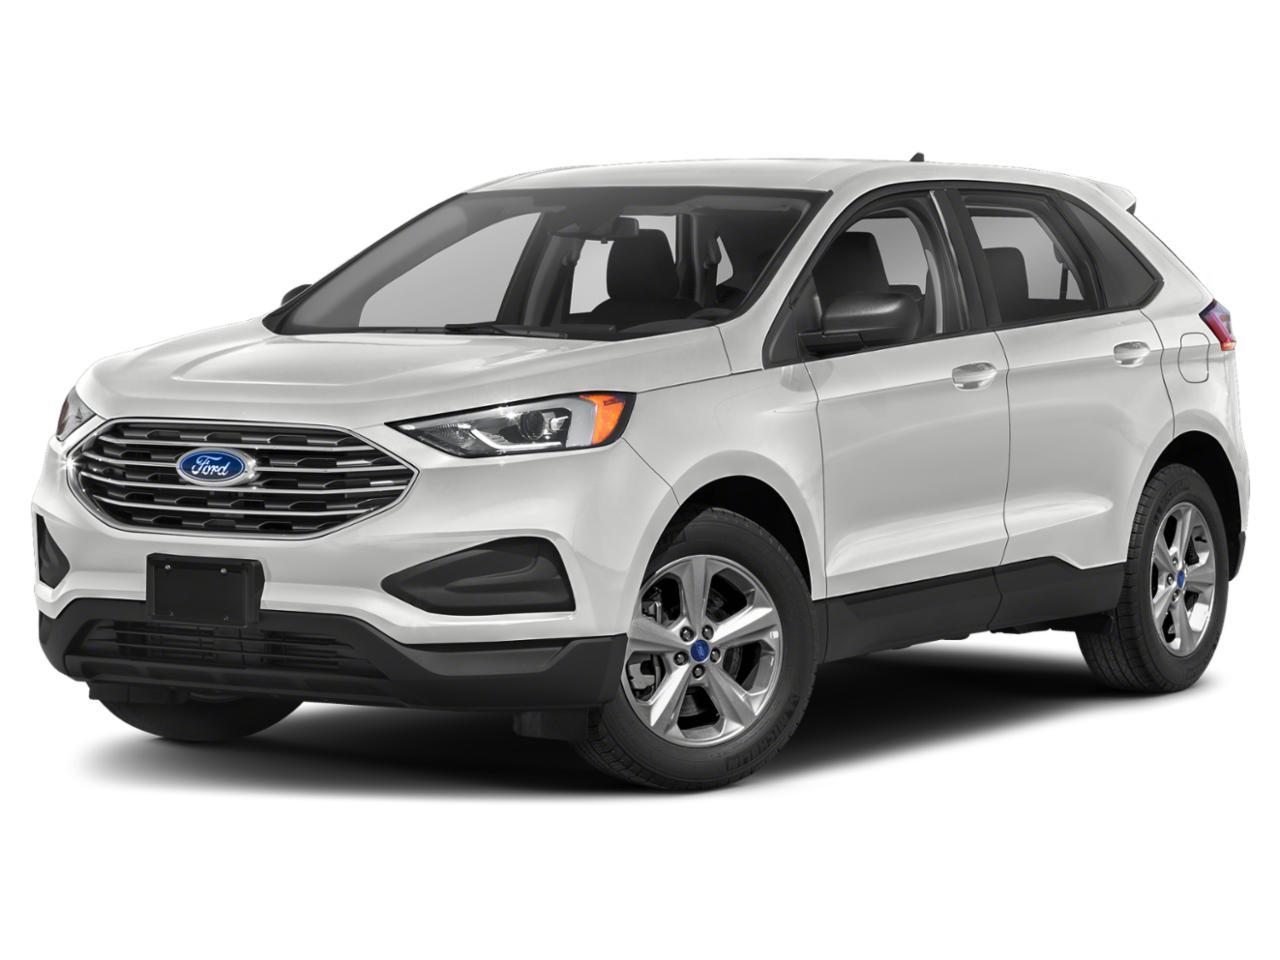 2021 Ford Edge Vehicle Photo in Neenah, WI 54956-3151